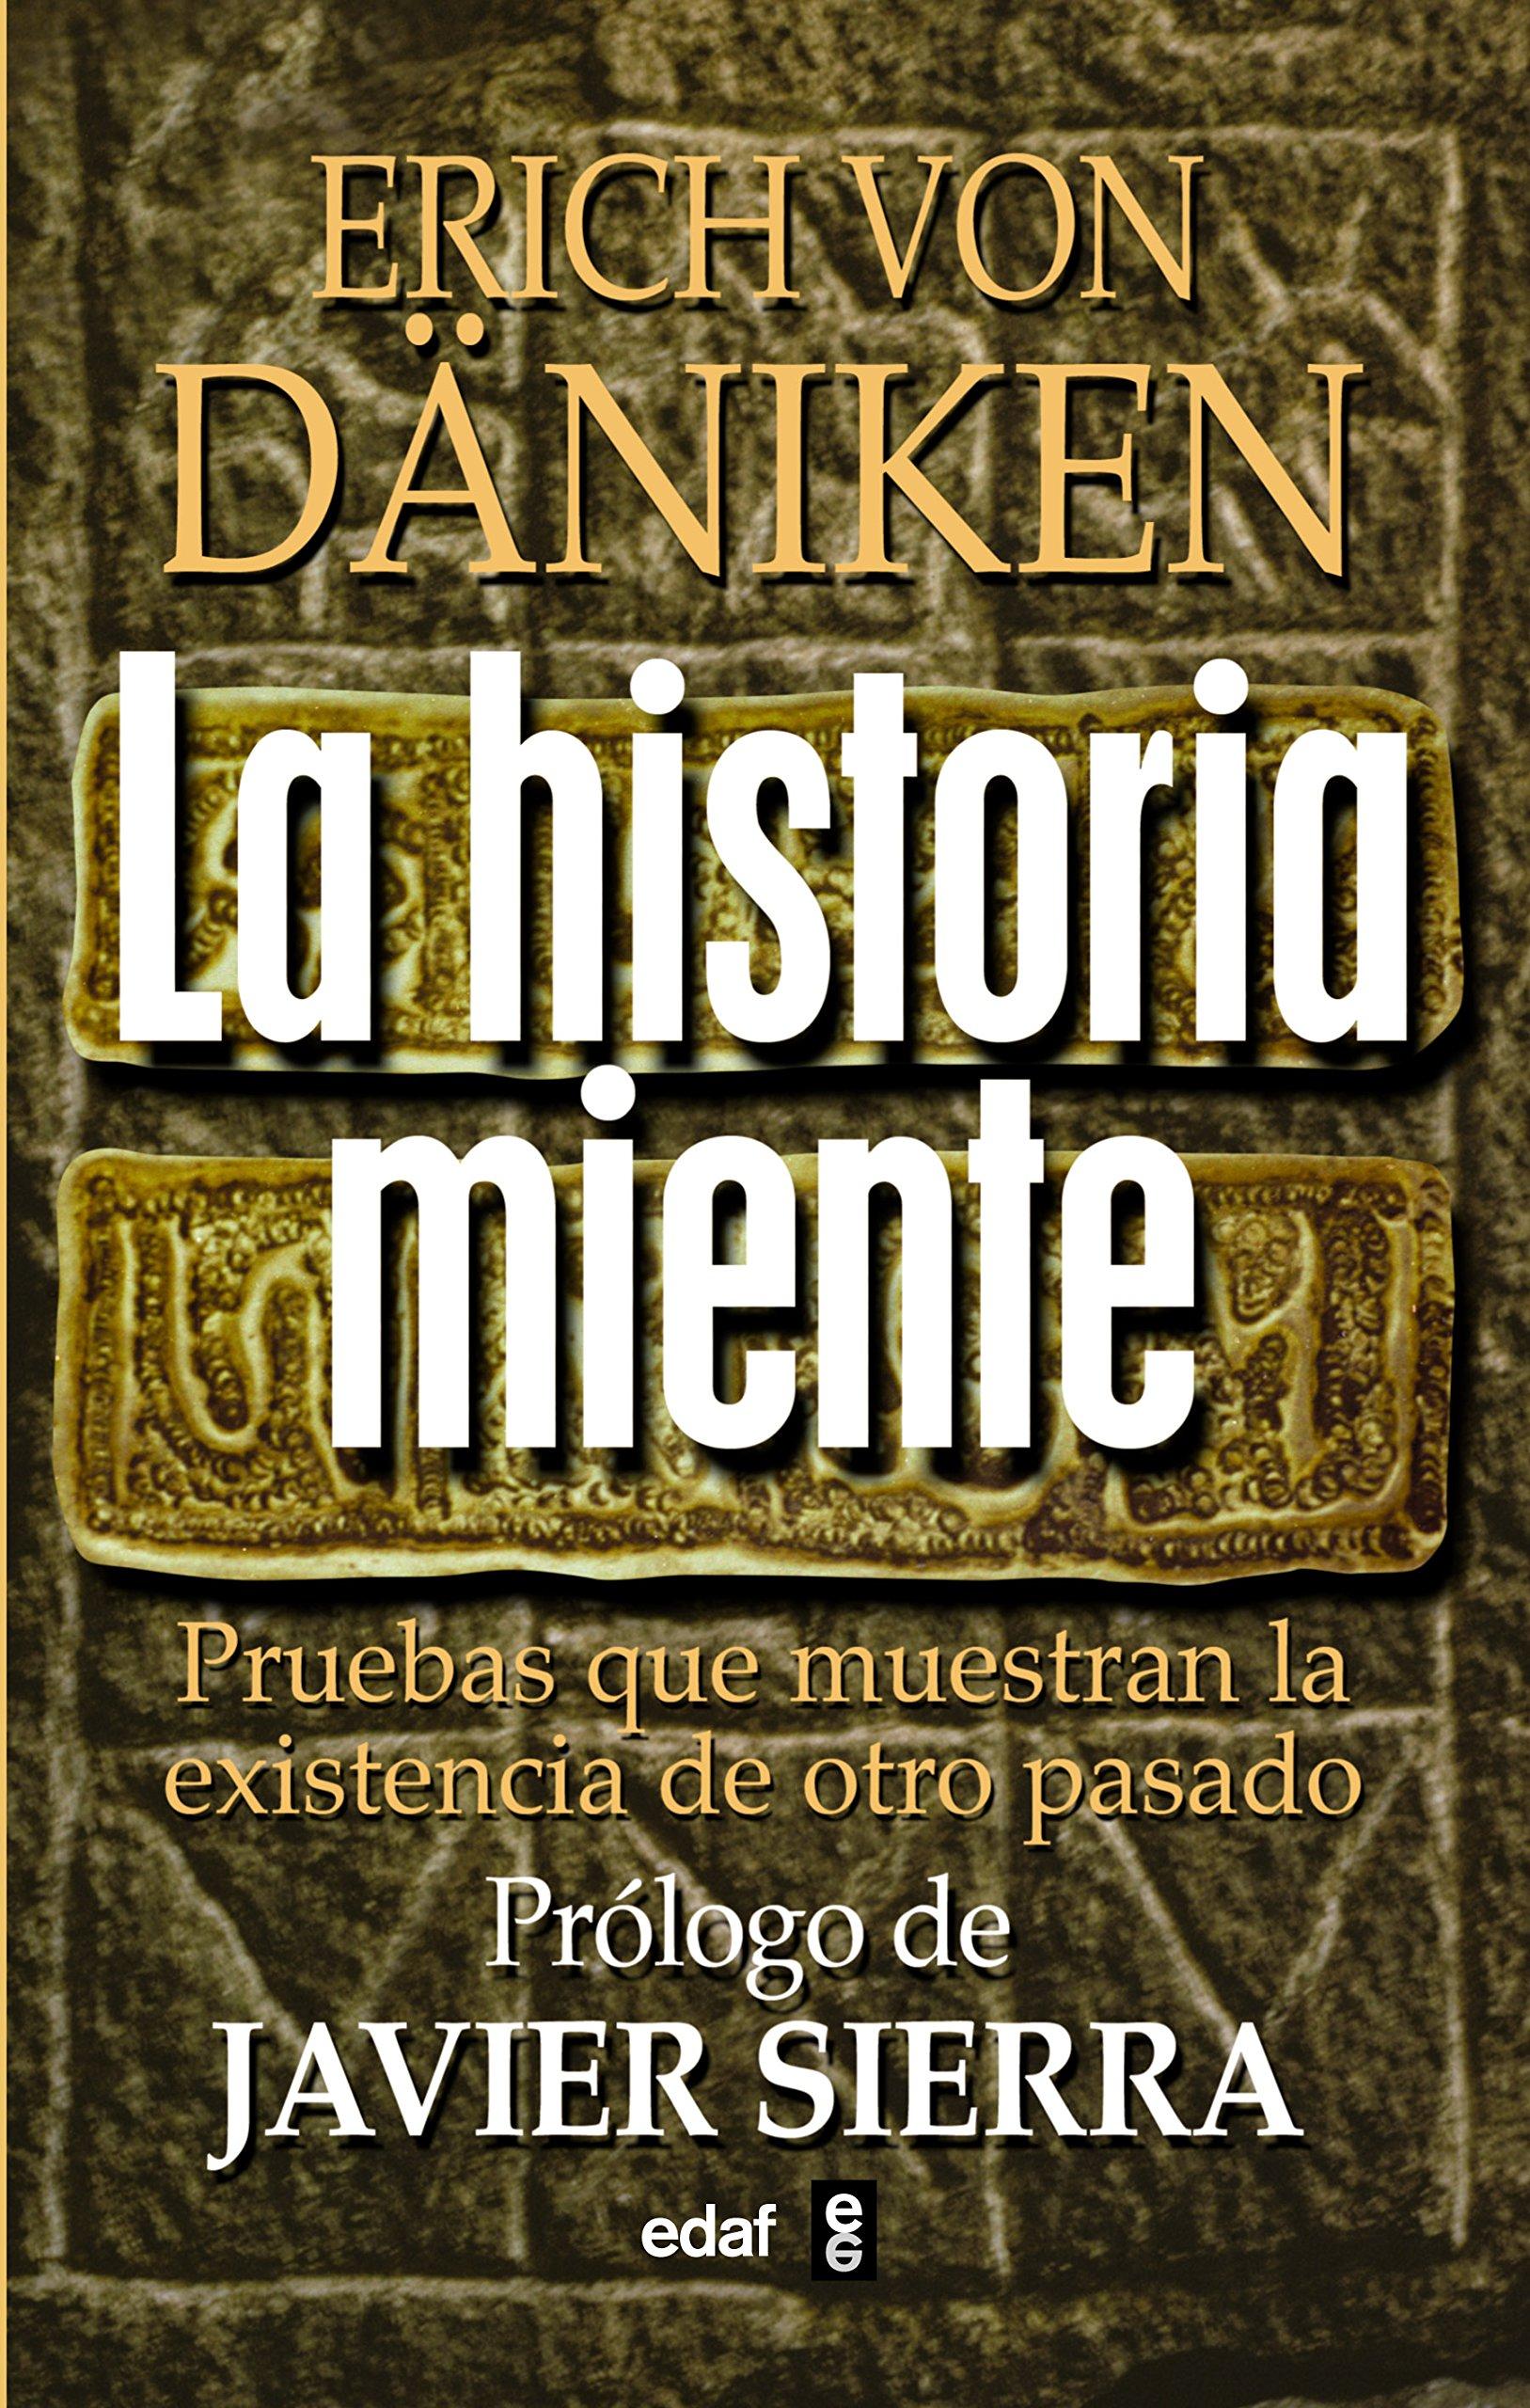 La Historia Miente Erich Von Daniken Epub Download